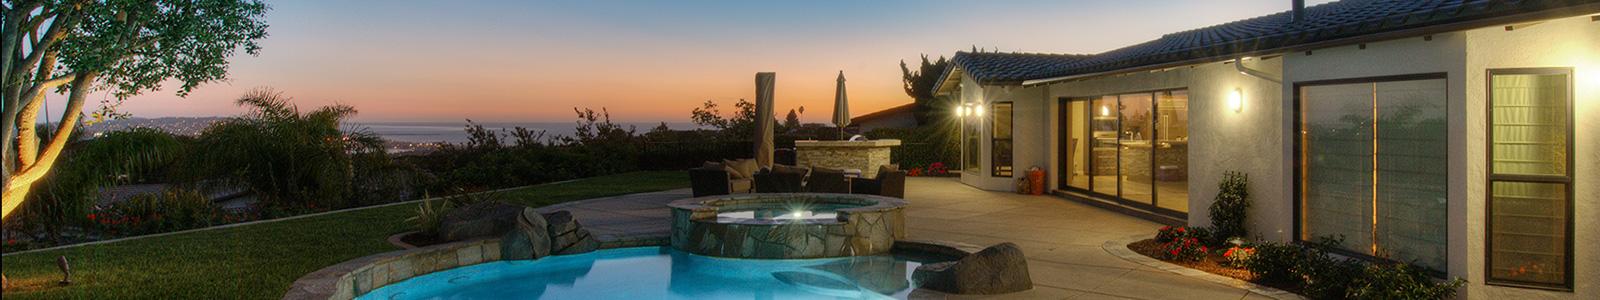 Lars Construction Lars Remodeling & Design  Carmel Mountain Ranch Remodeling and Design